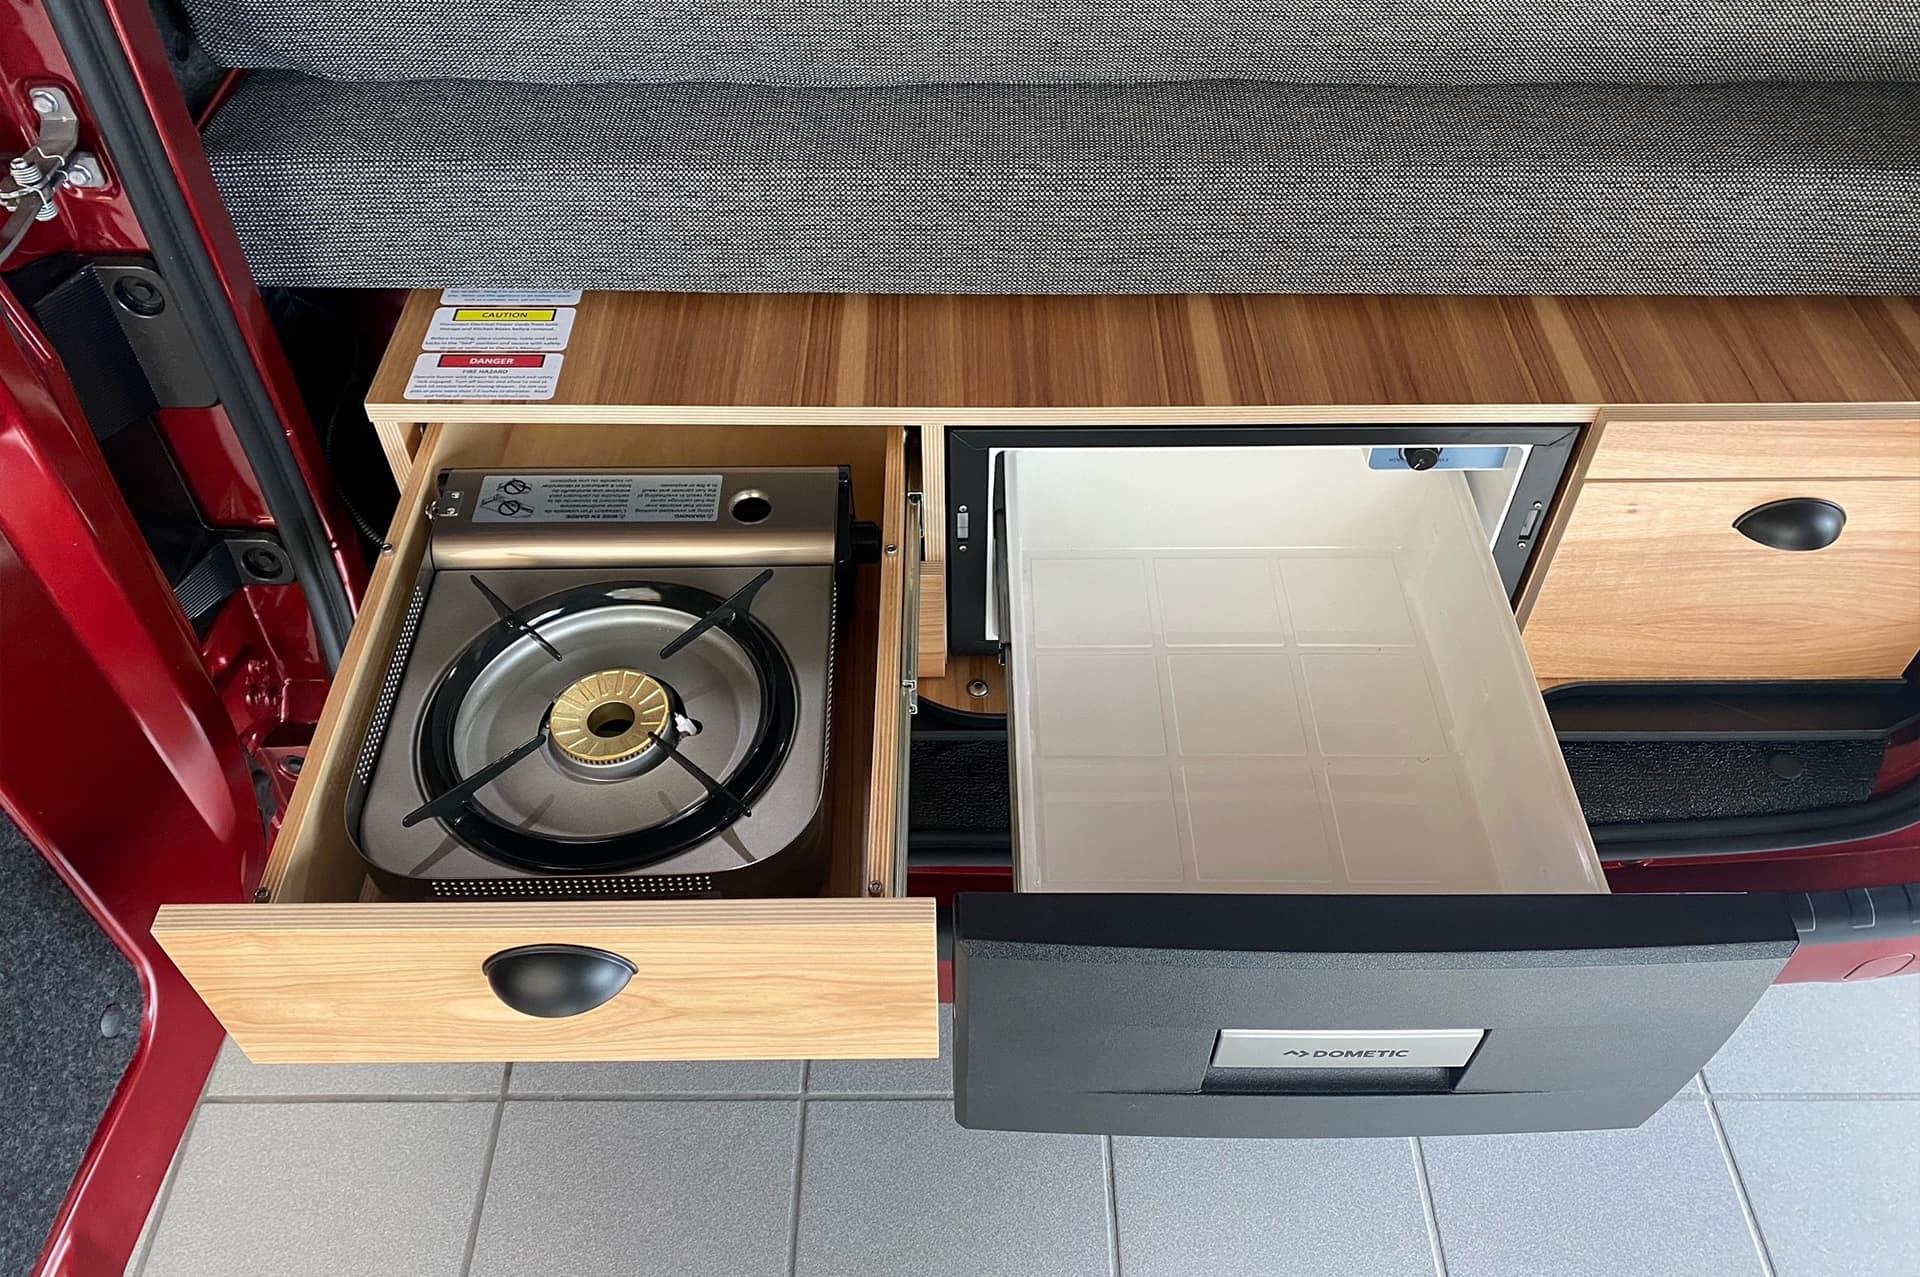 Slide out portable butane stove and 31 quart refrigerator